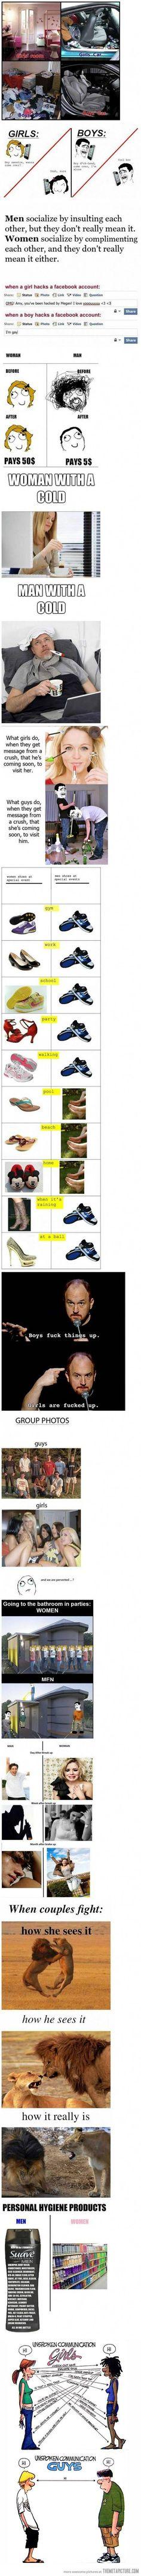 exactly! lol